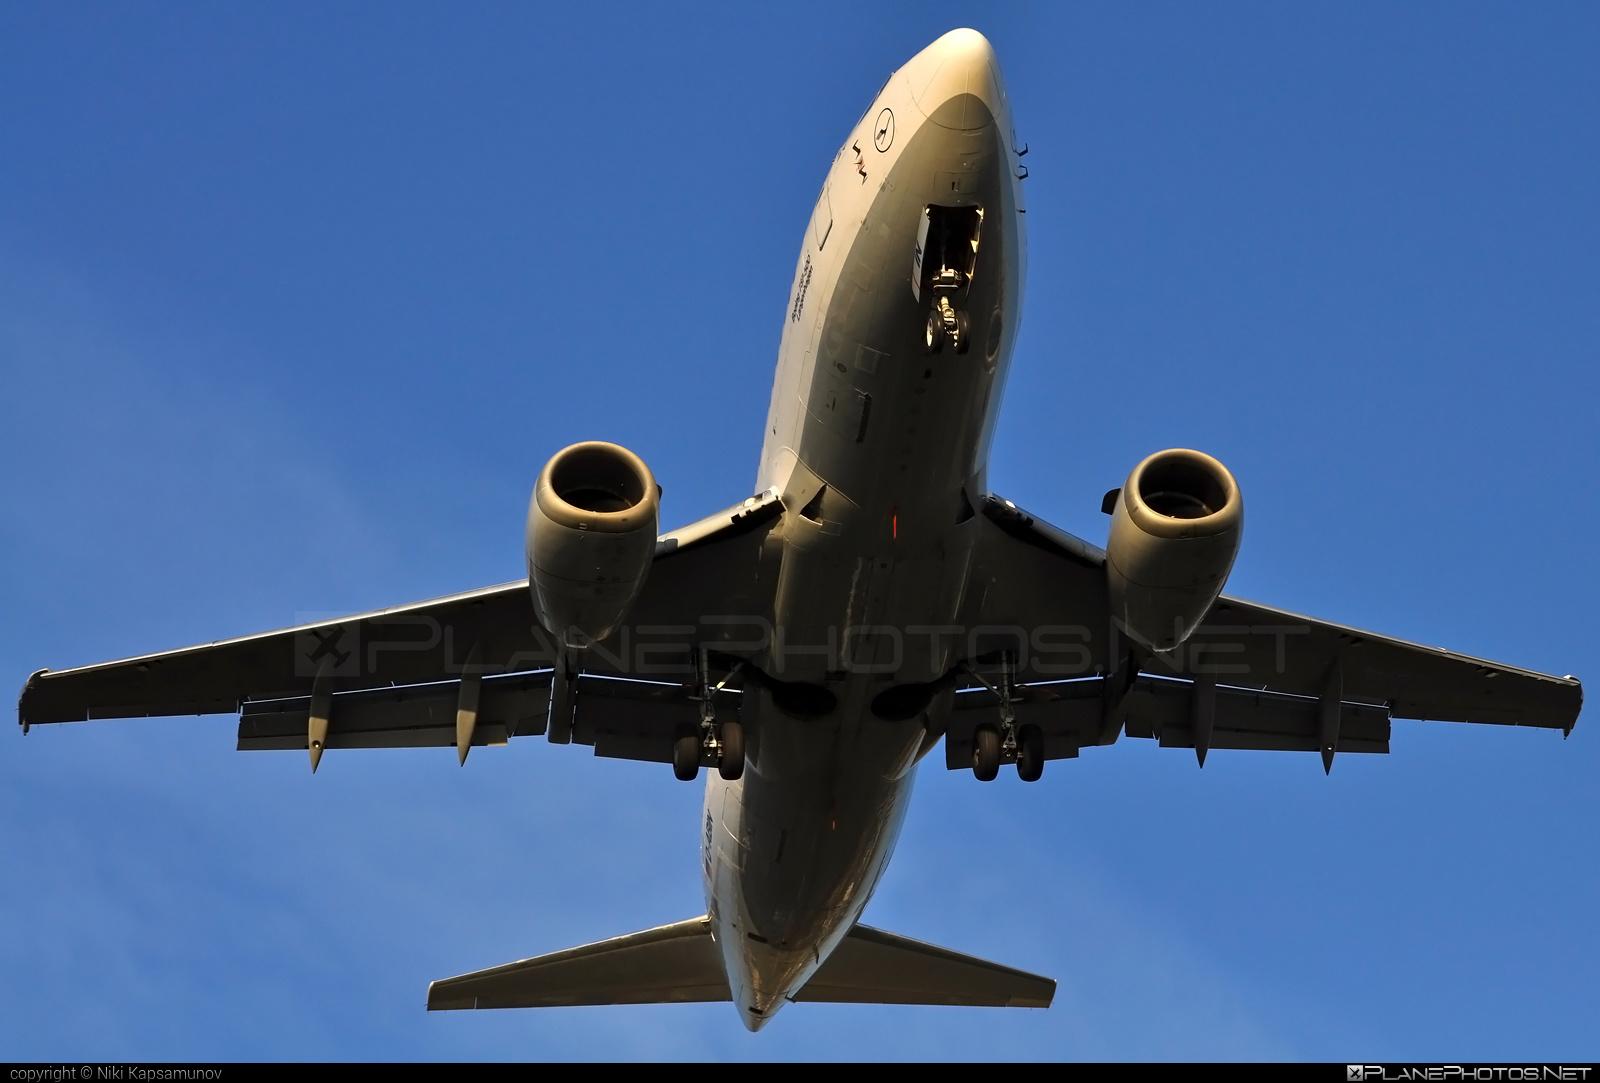 Boeing 737-500 - D-ABIN operated by Lufthansa #b737 #boeing #boeing737 #lufthansa